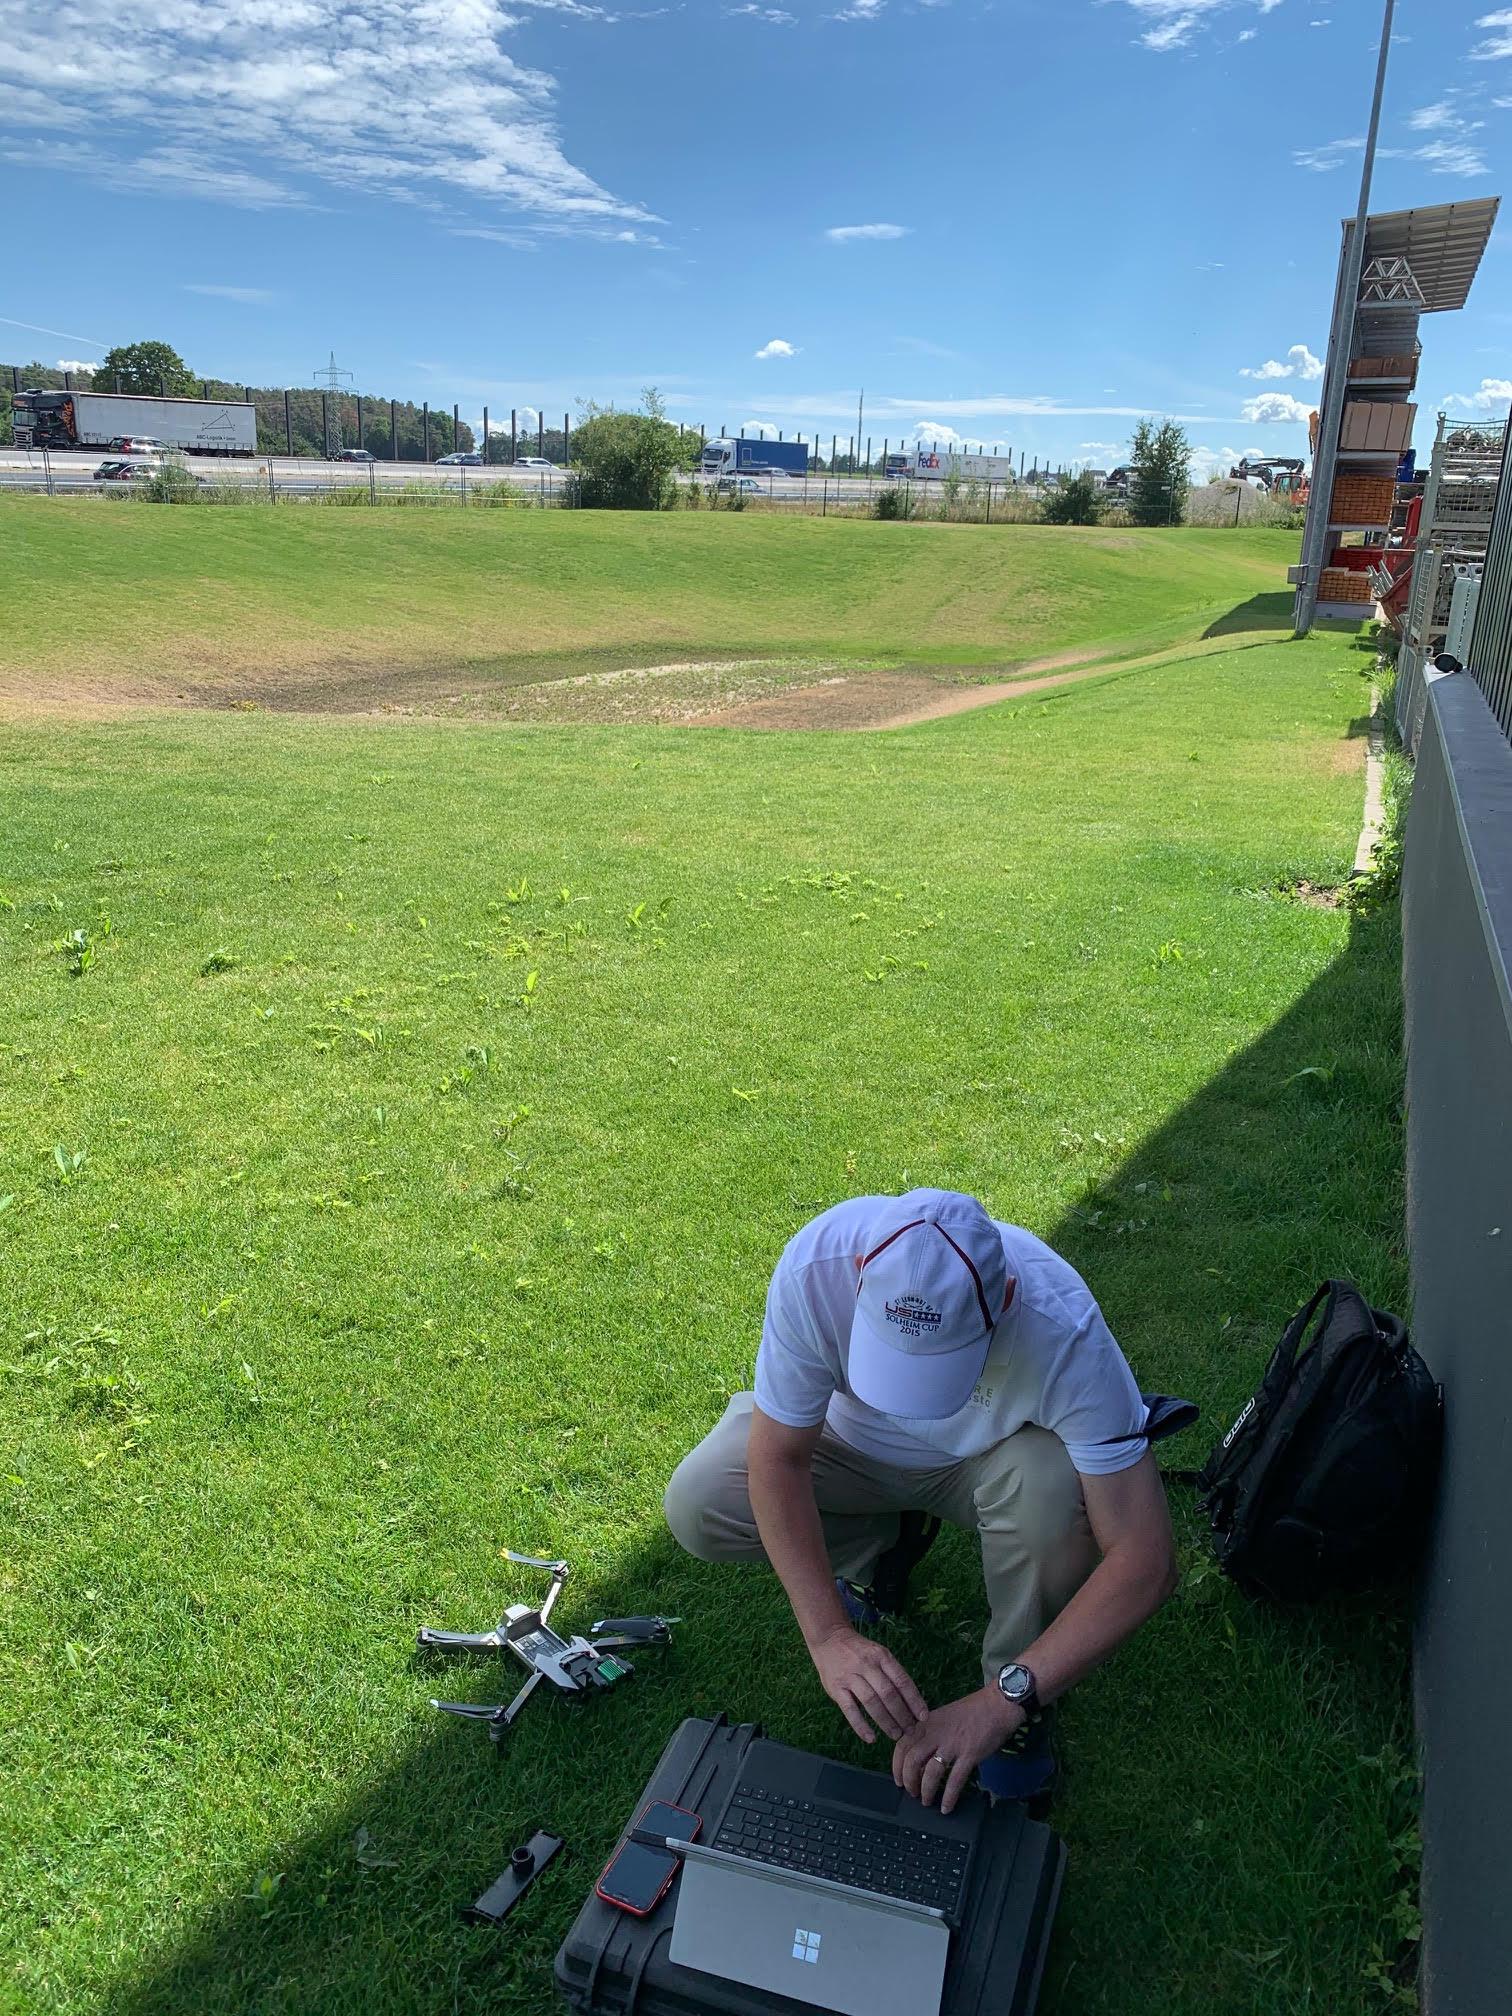 Rasenanalyse mit Drohne